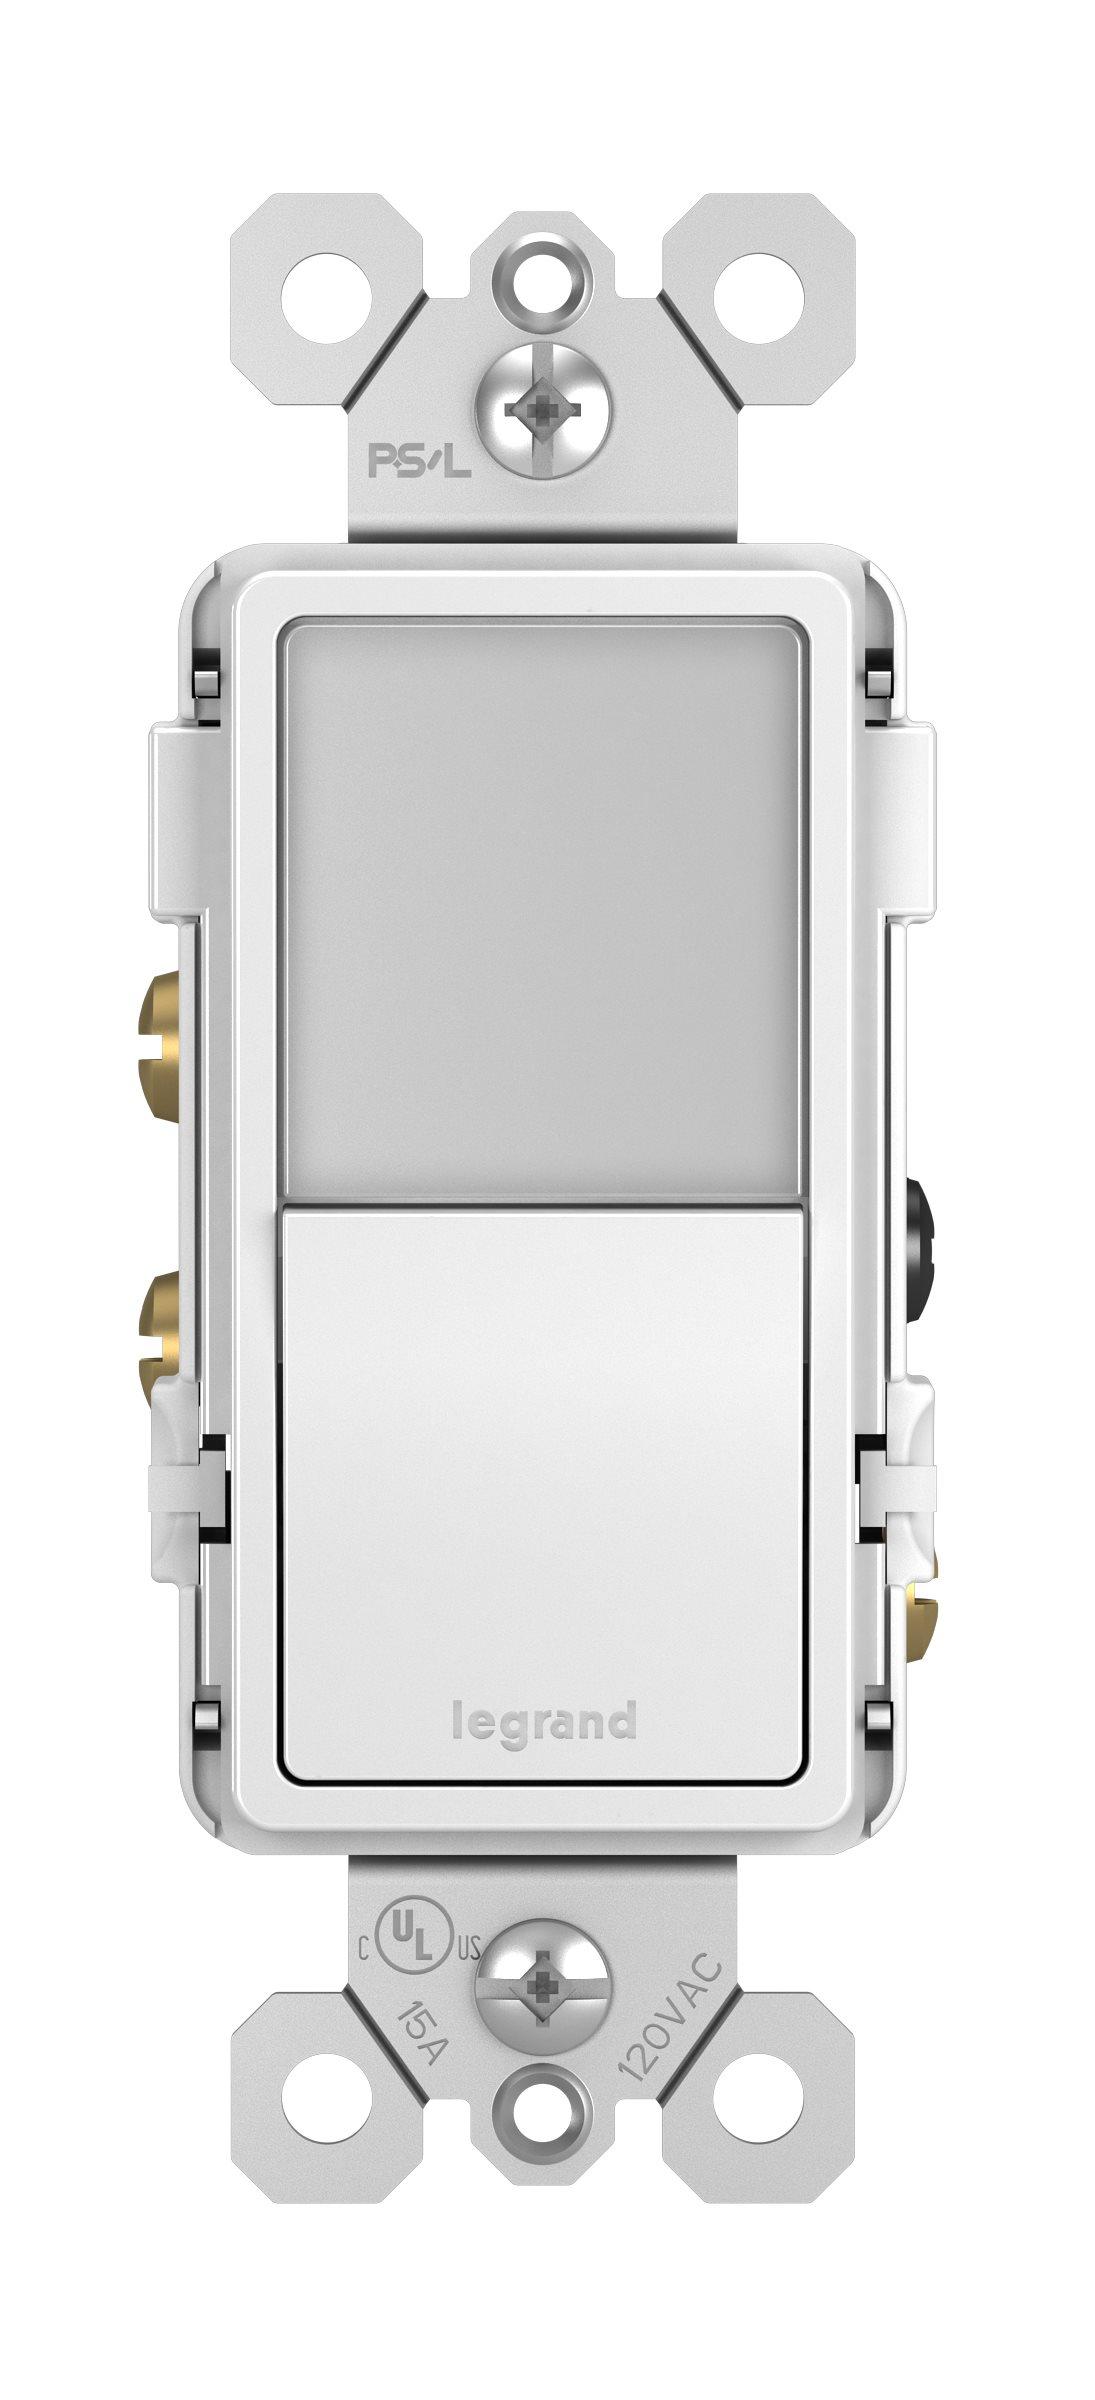 Legrand Radiant Night Light Single Pole 3 Way Switch White 2